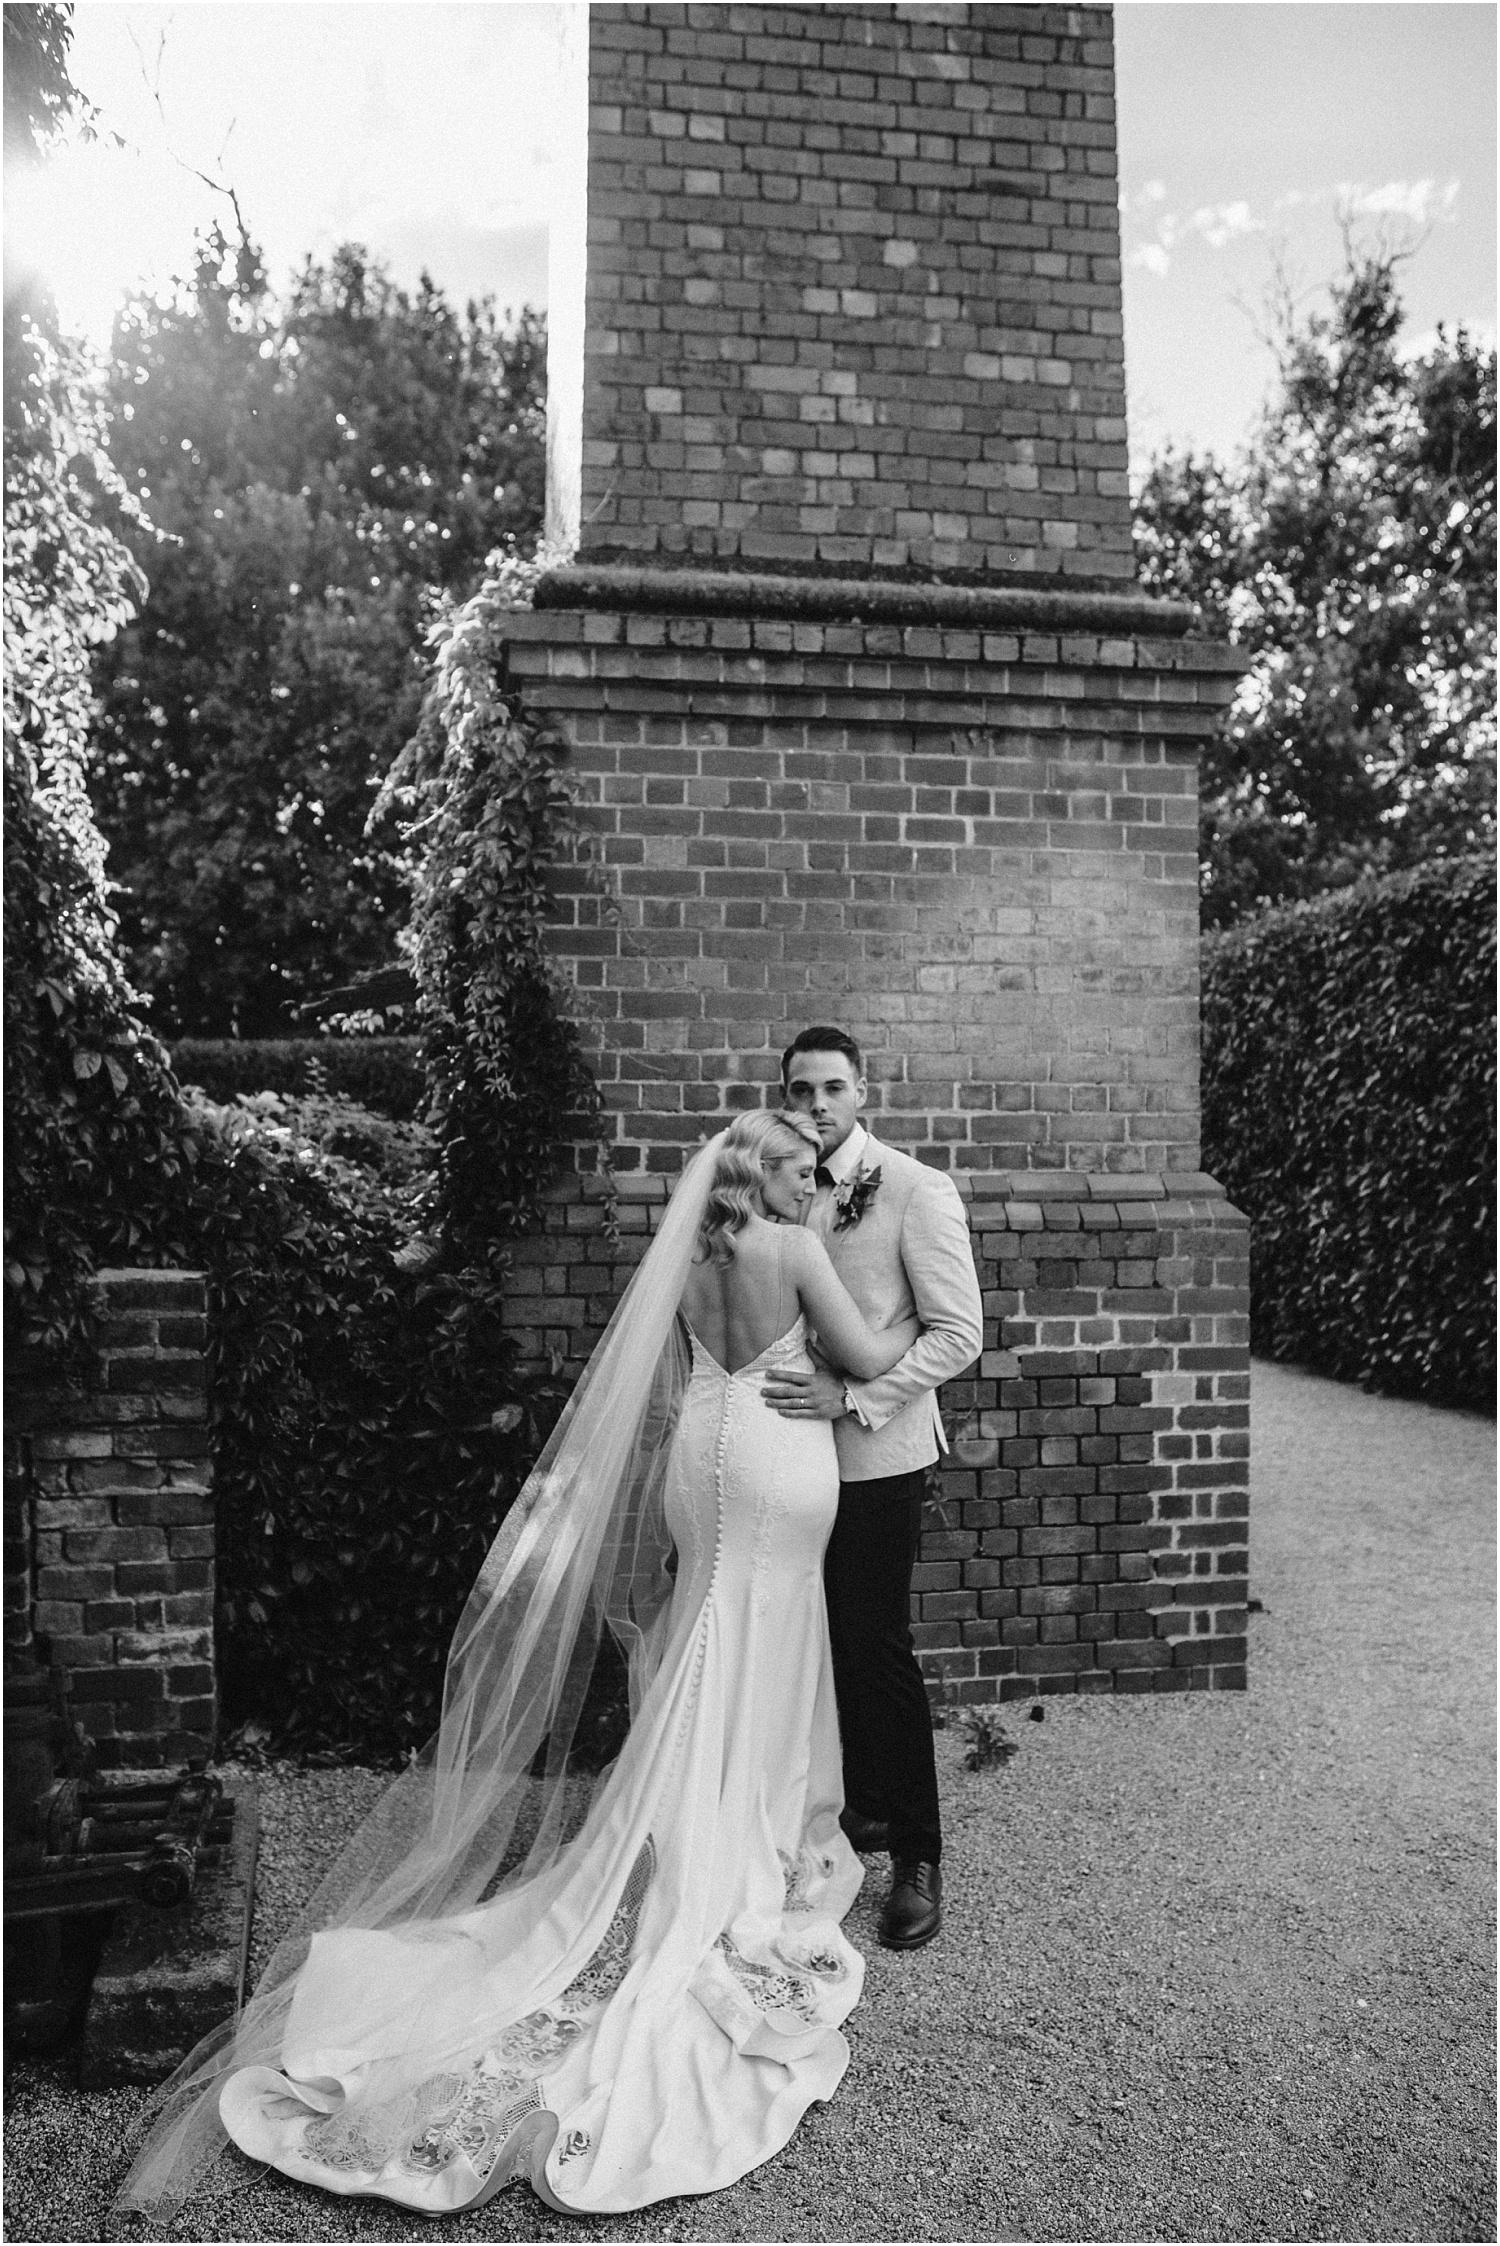 Katherine and Sam's stylish elopment at the Euroa Butter Factory._0070.jpg